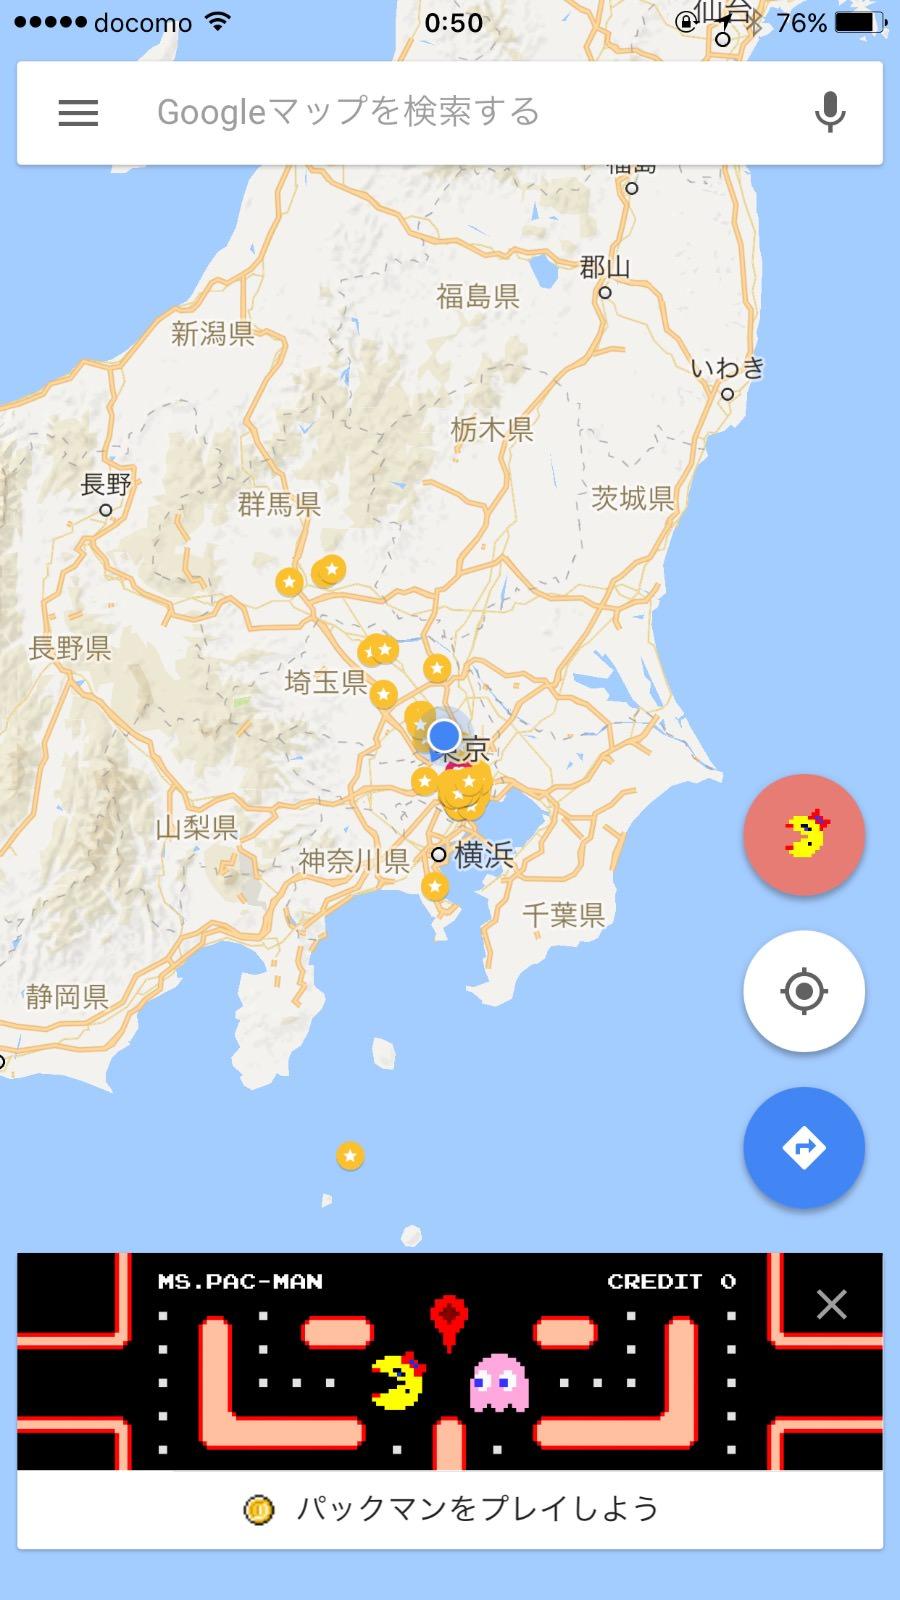 Pacman googlemap 8737